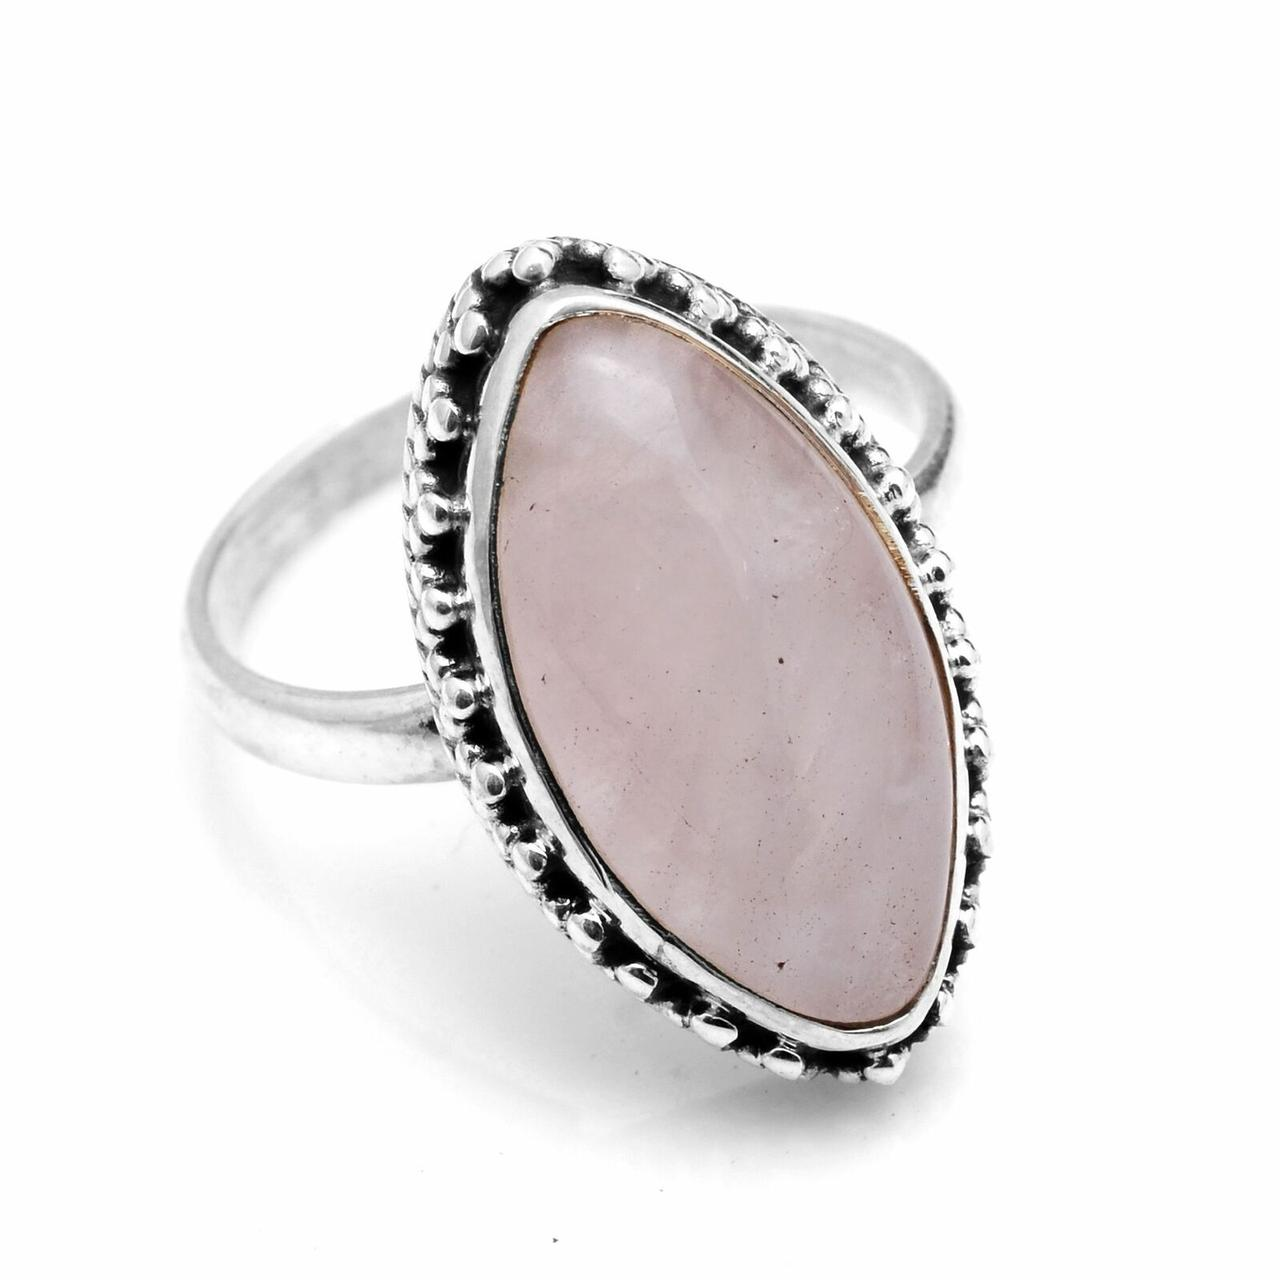 Кольцо из серебра с розовым кварцем, 18*10 мм., 1774КЦР